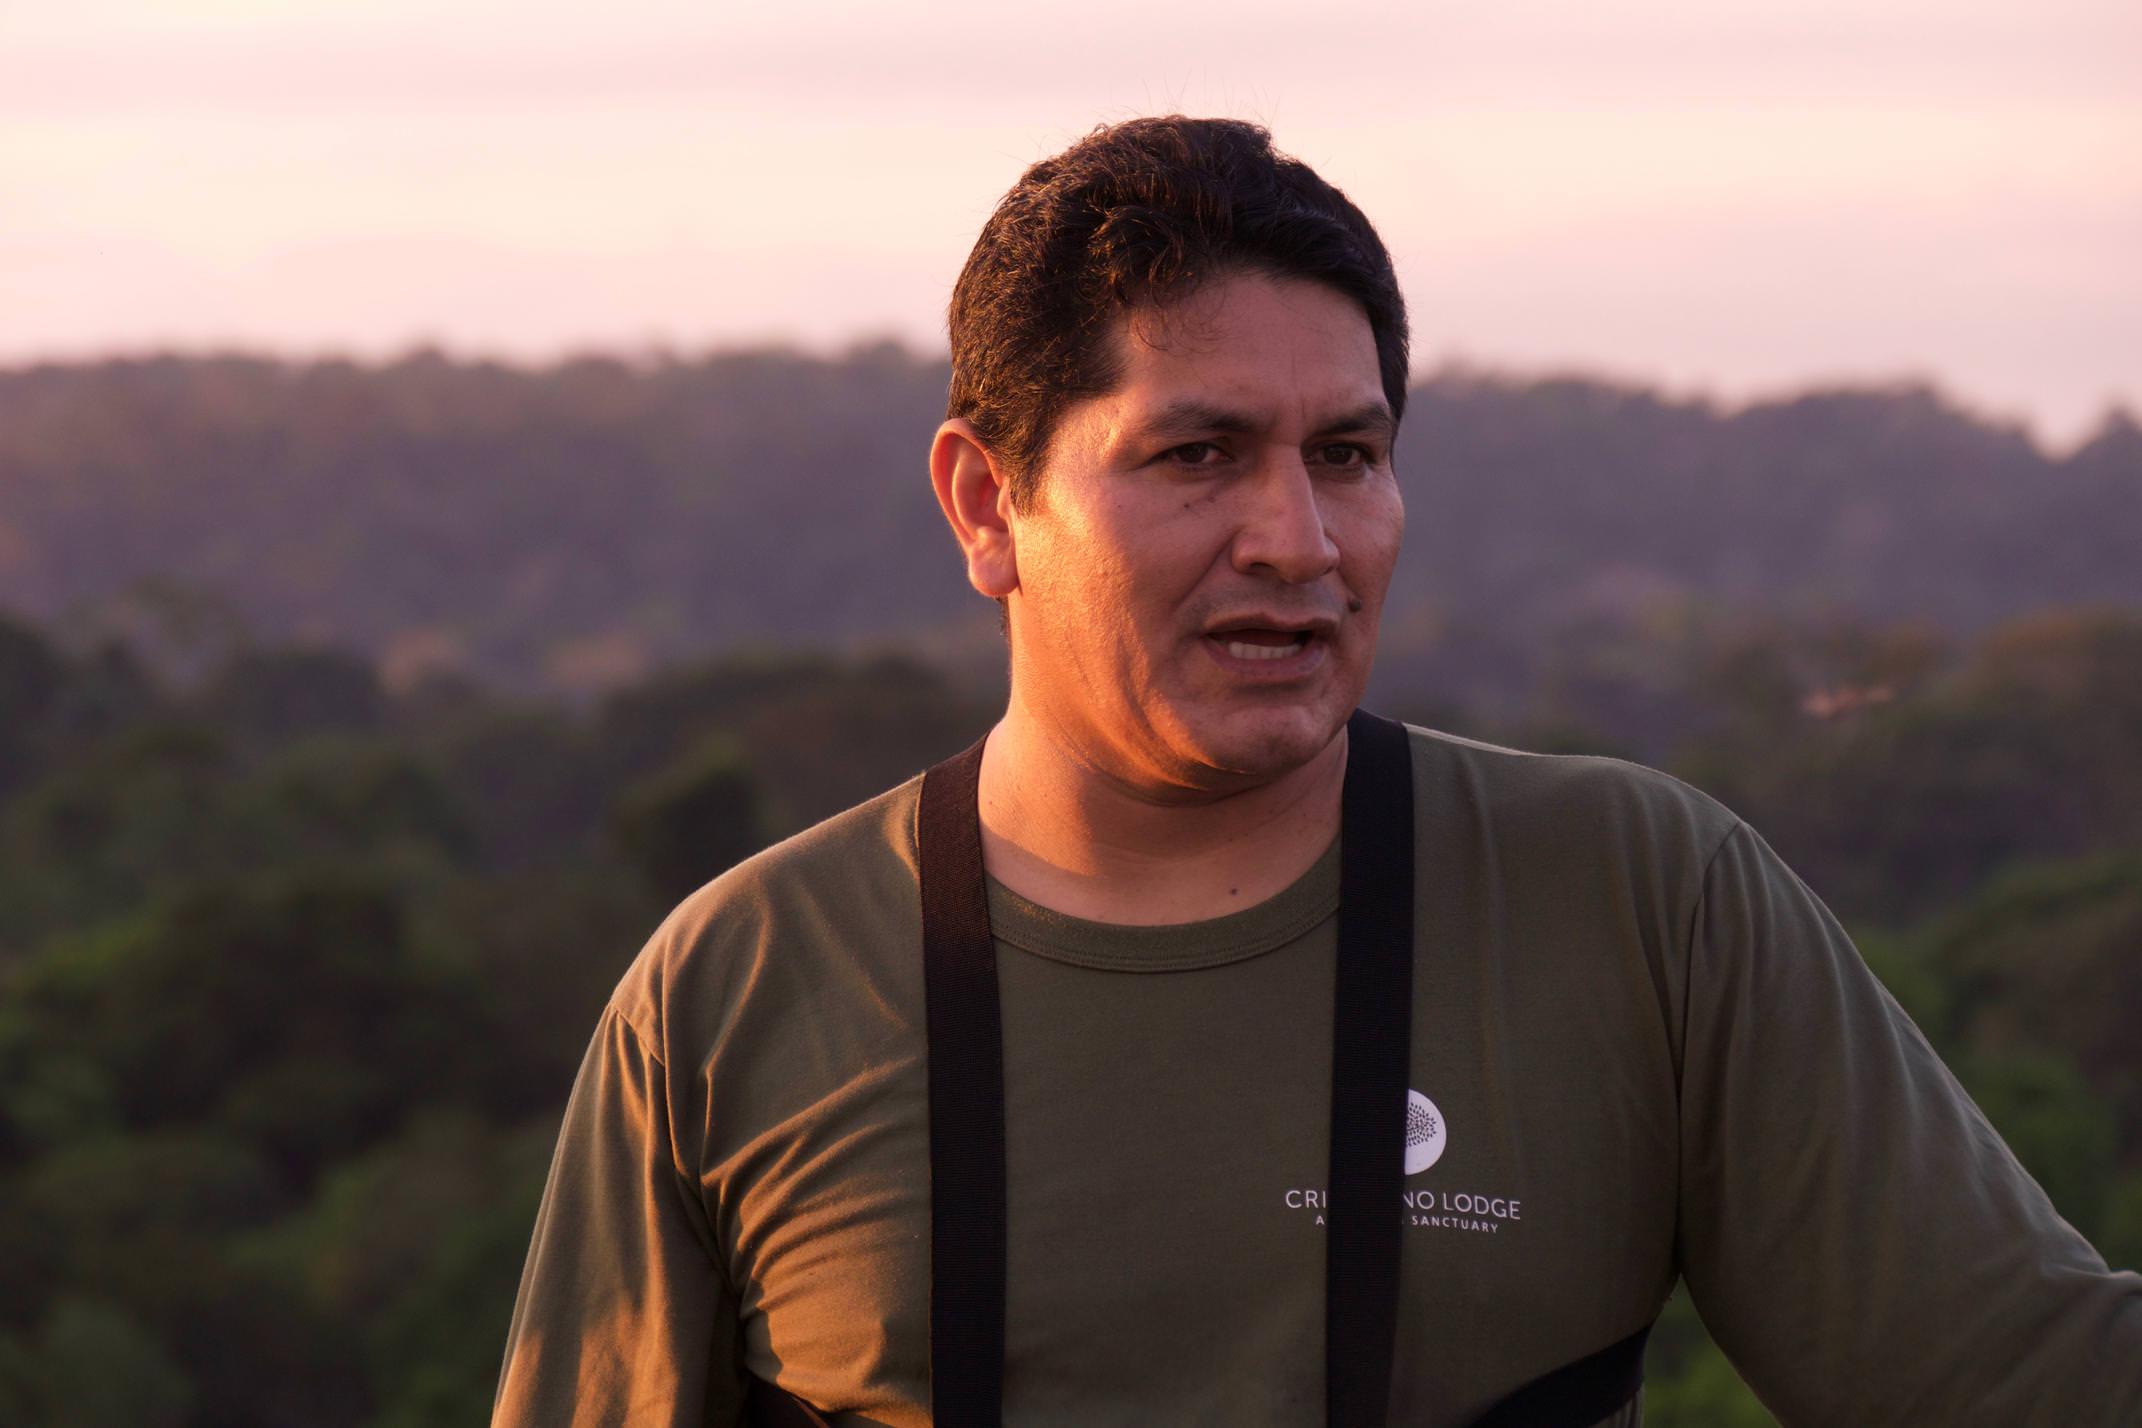 Brazil amazon cristalino lodge guide braulio copyright thomas power pura aventura